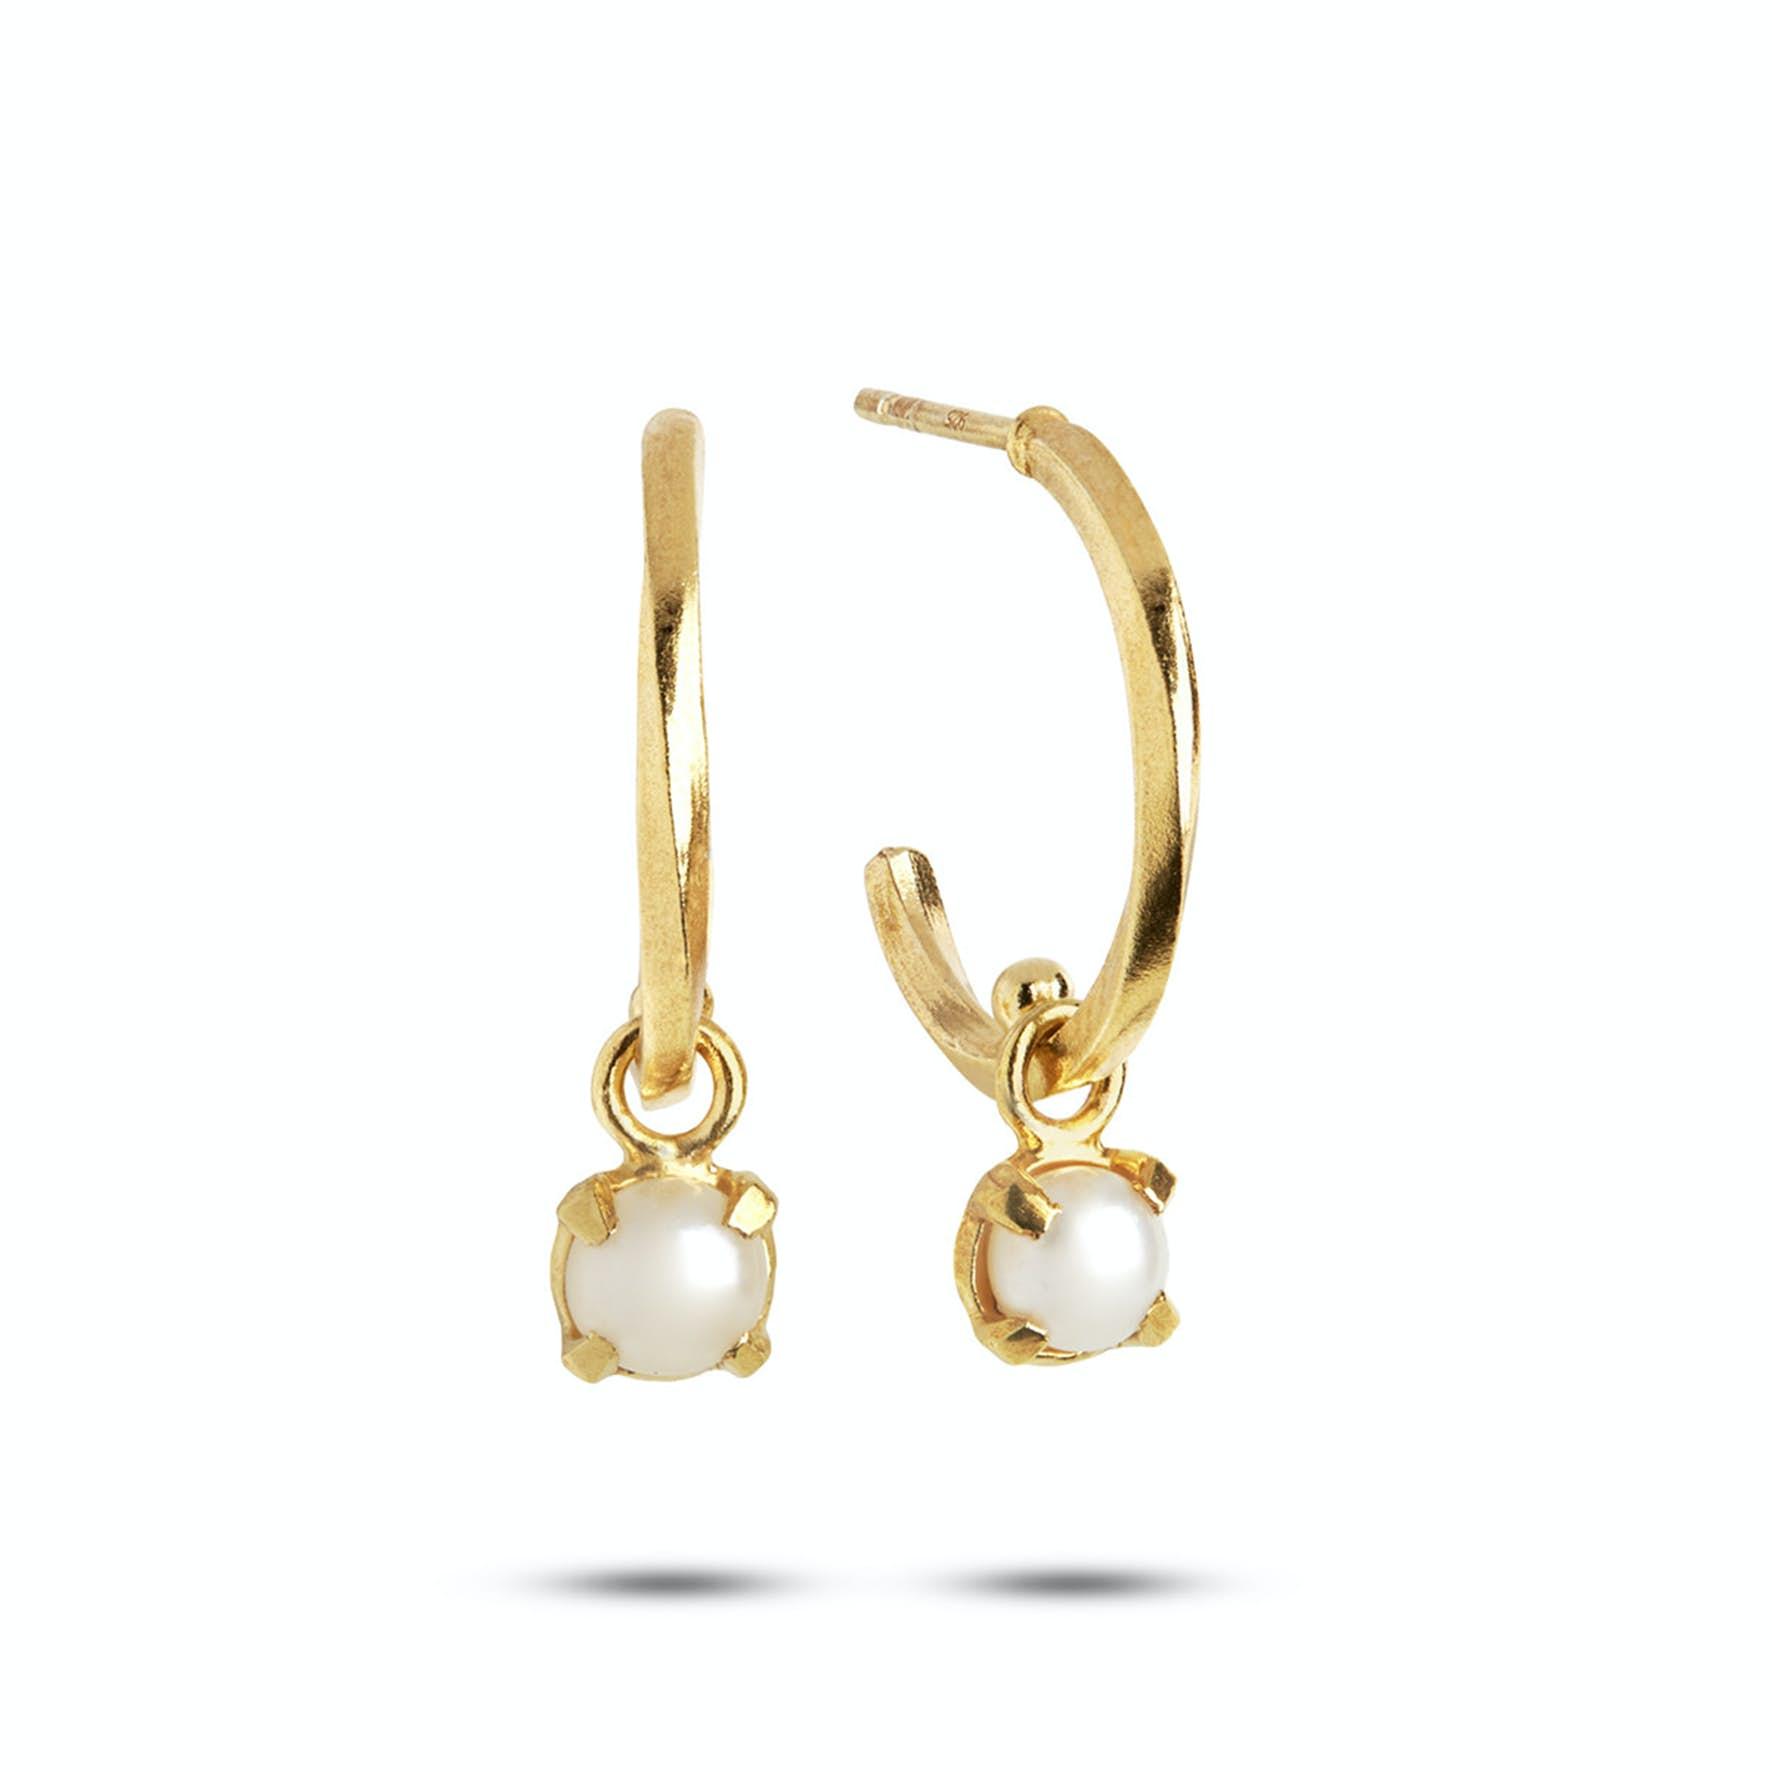 Purity Hoops Pearl von Carré in Vergoldet-Silber Sterling 925|Freshwater Pearl|Blank